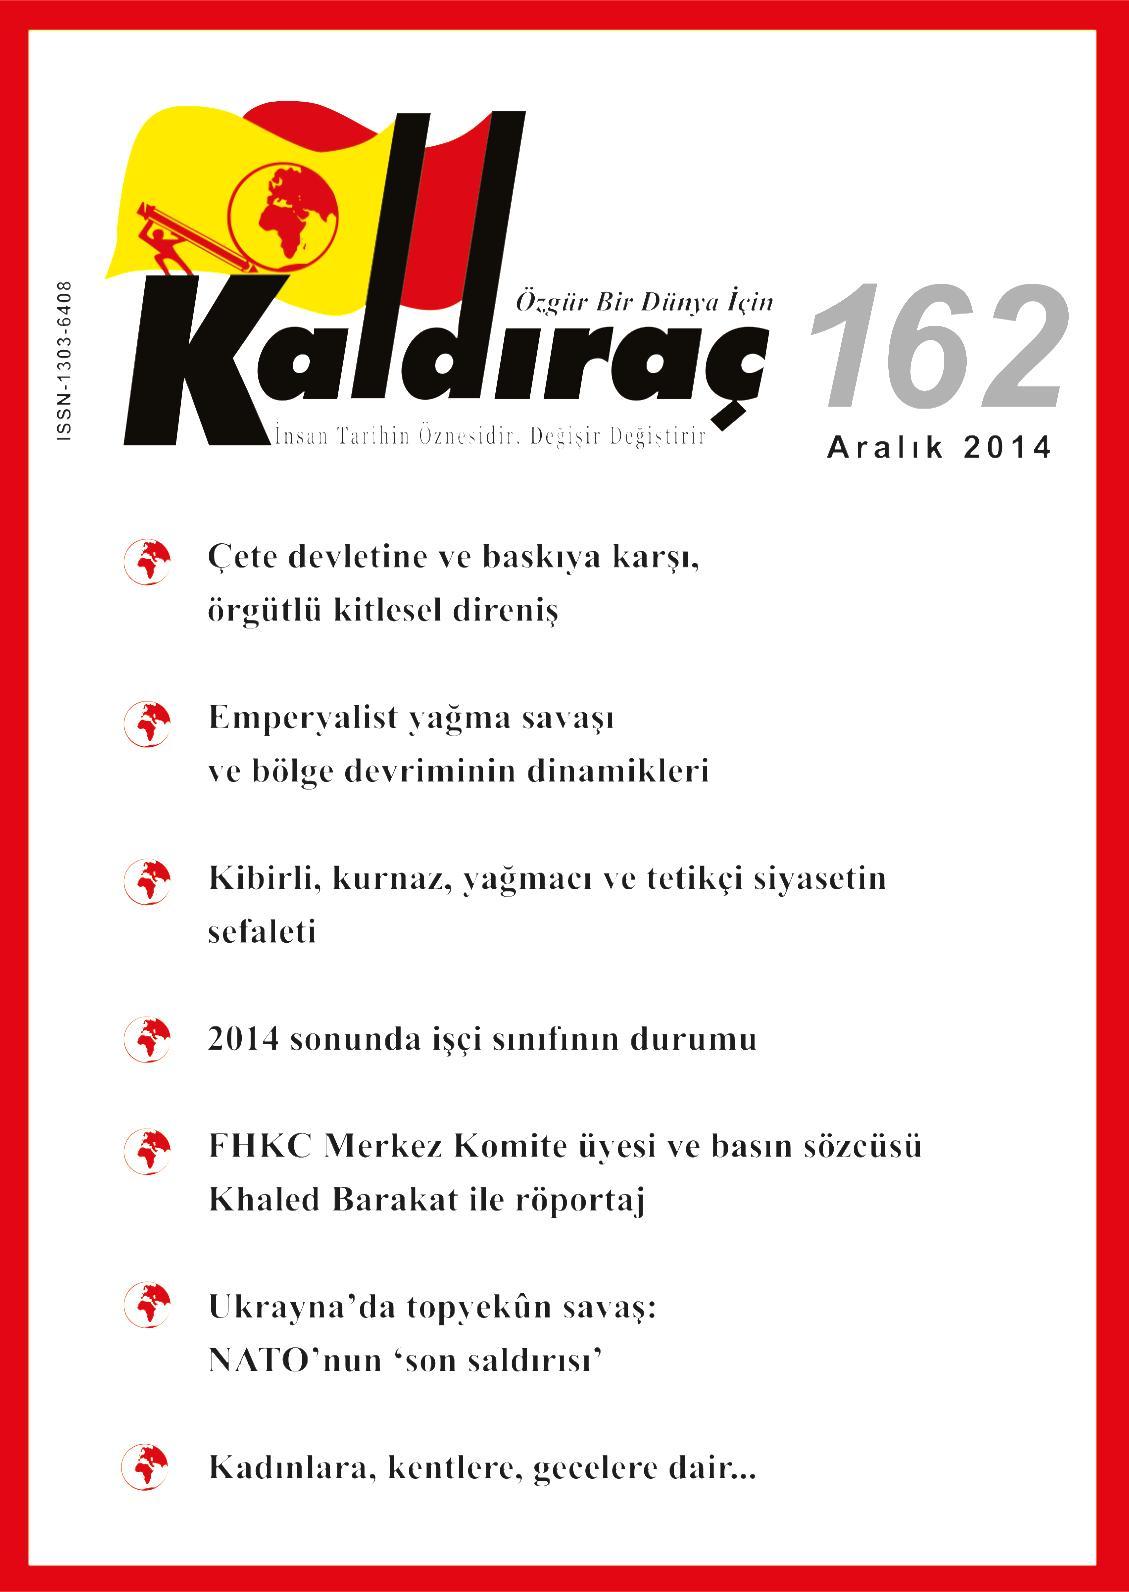 Calameo Kaldirac 162 Sayi Aralik 2014